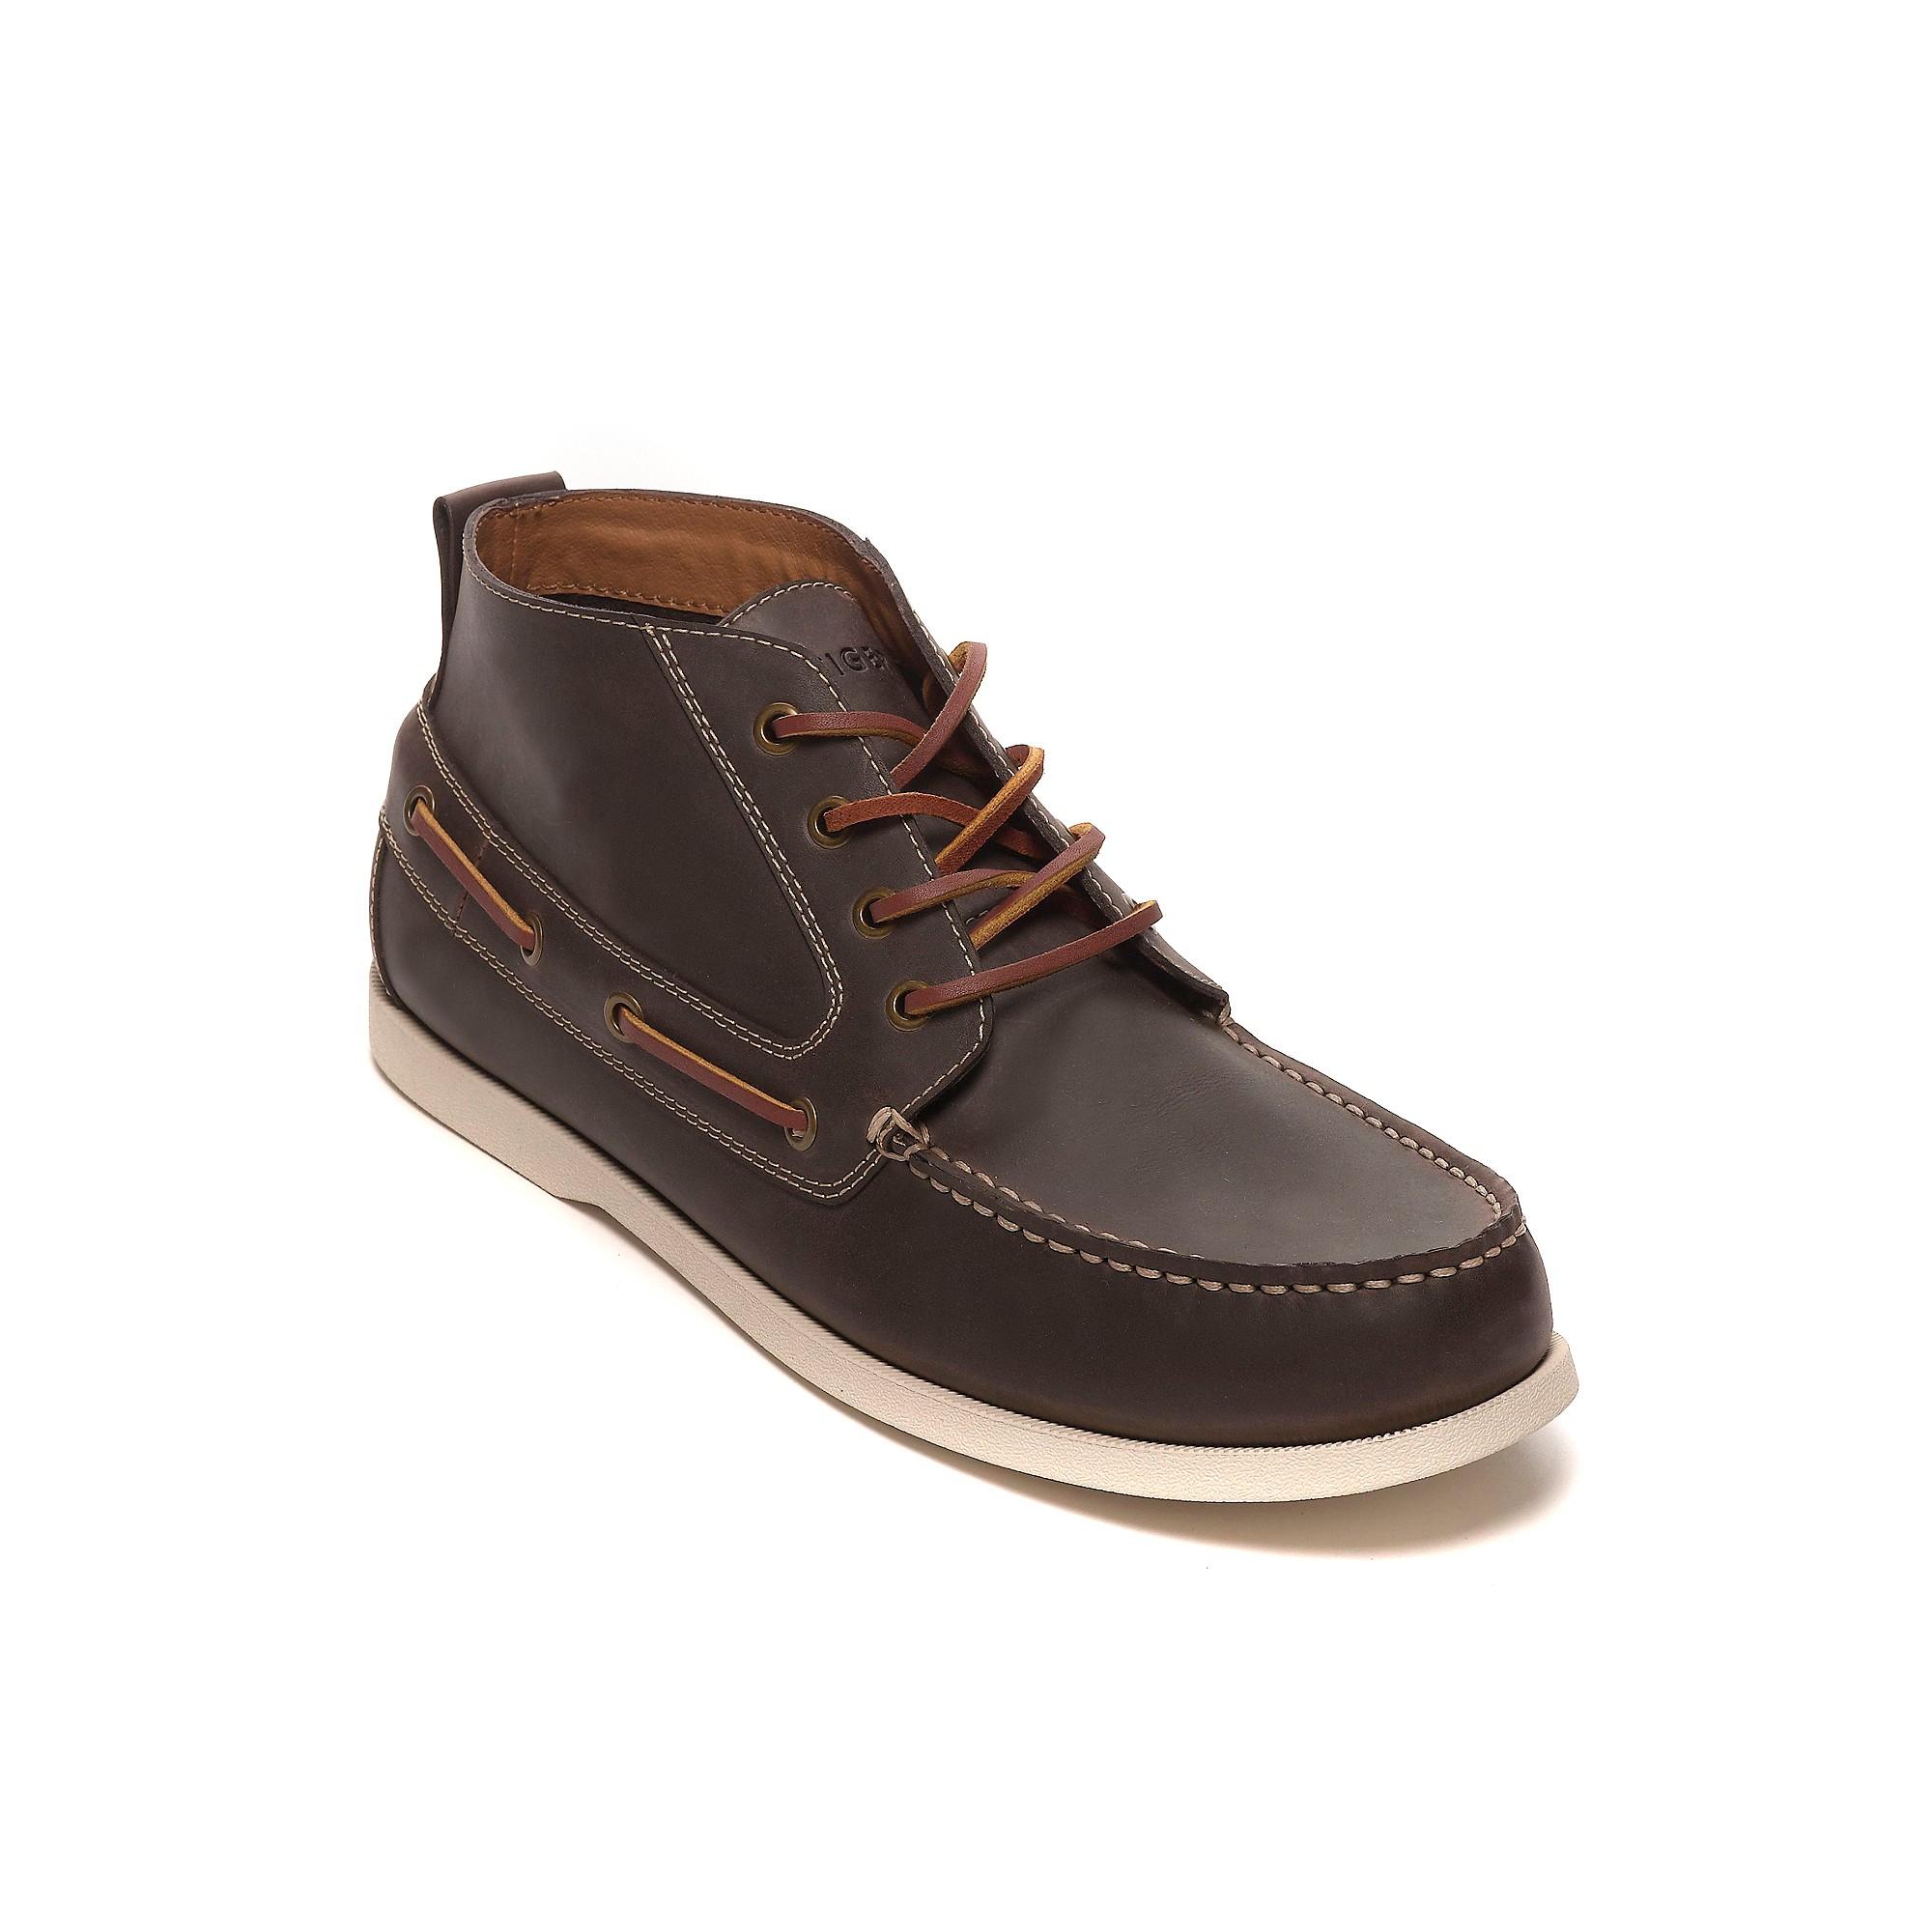 tommy hilfiger topsider boot in brown for men coffee bean. Black Bedroom Furniture Sets. Home Design Ideas